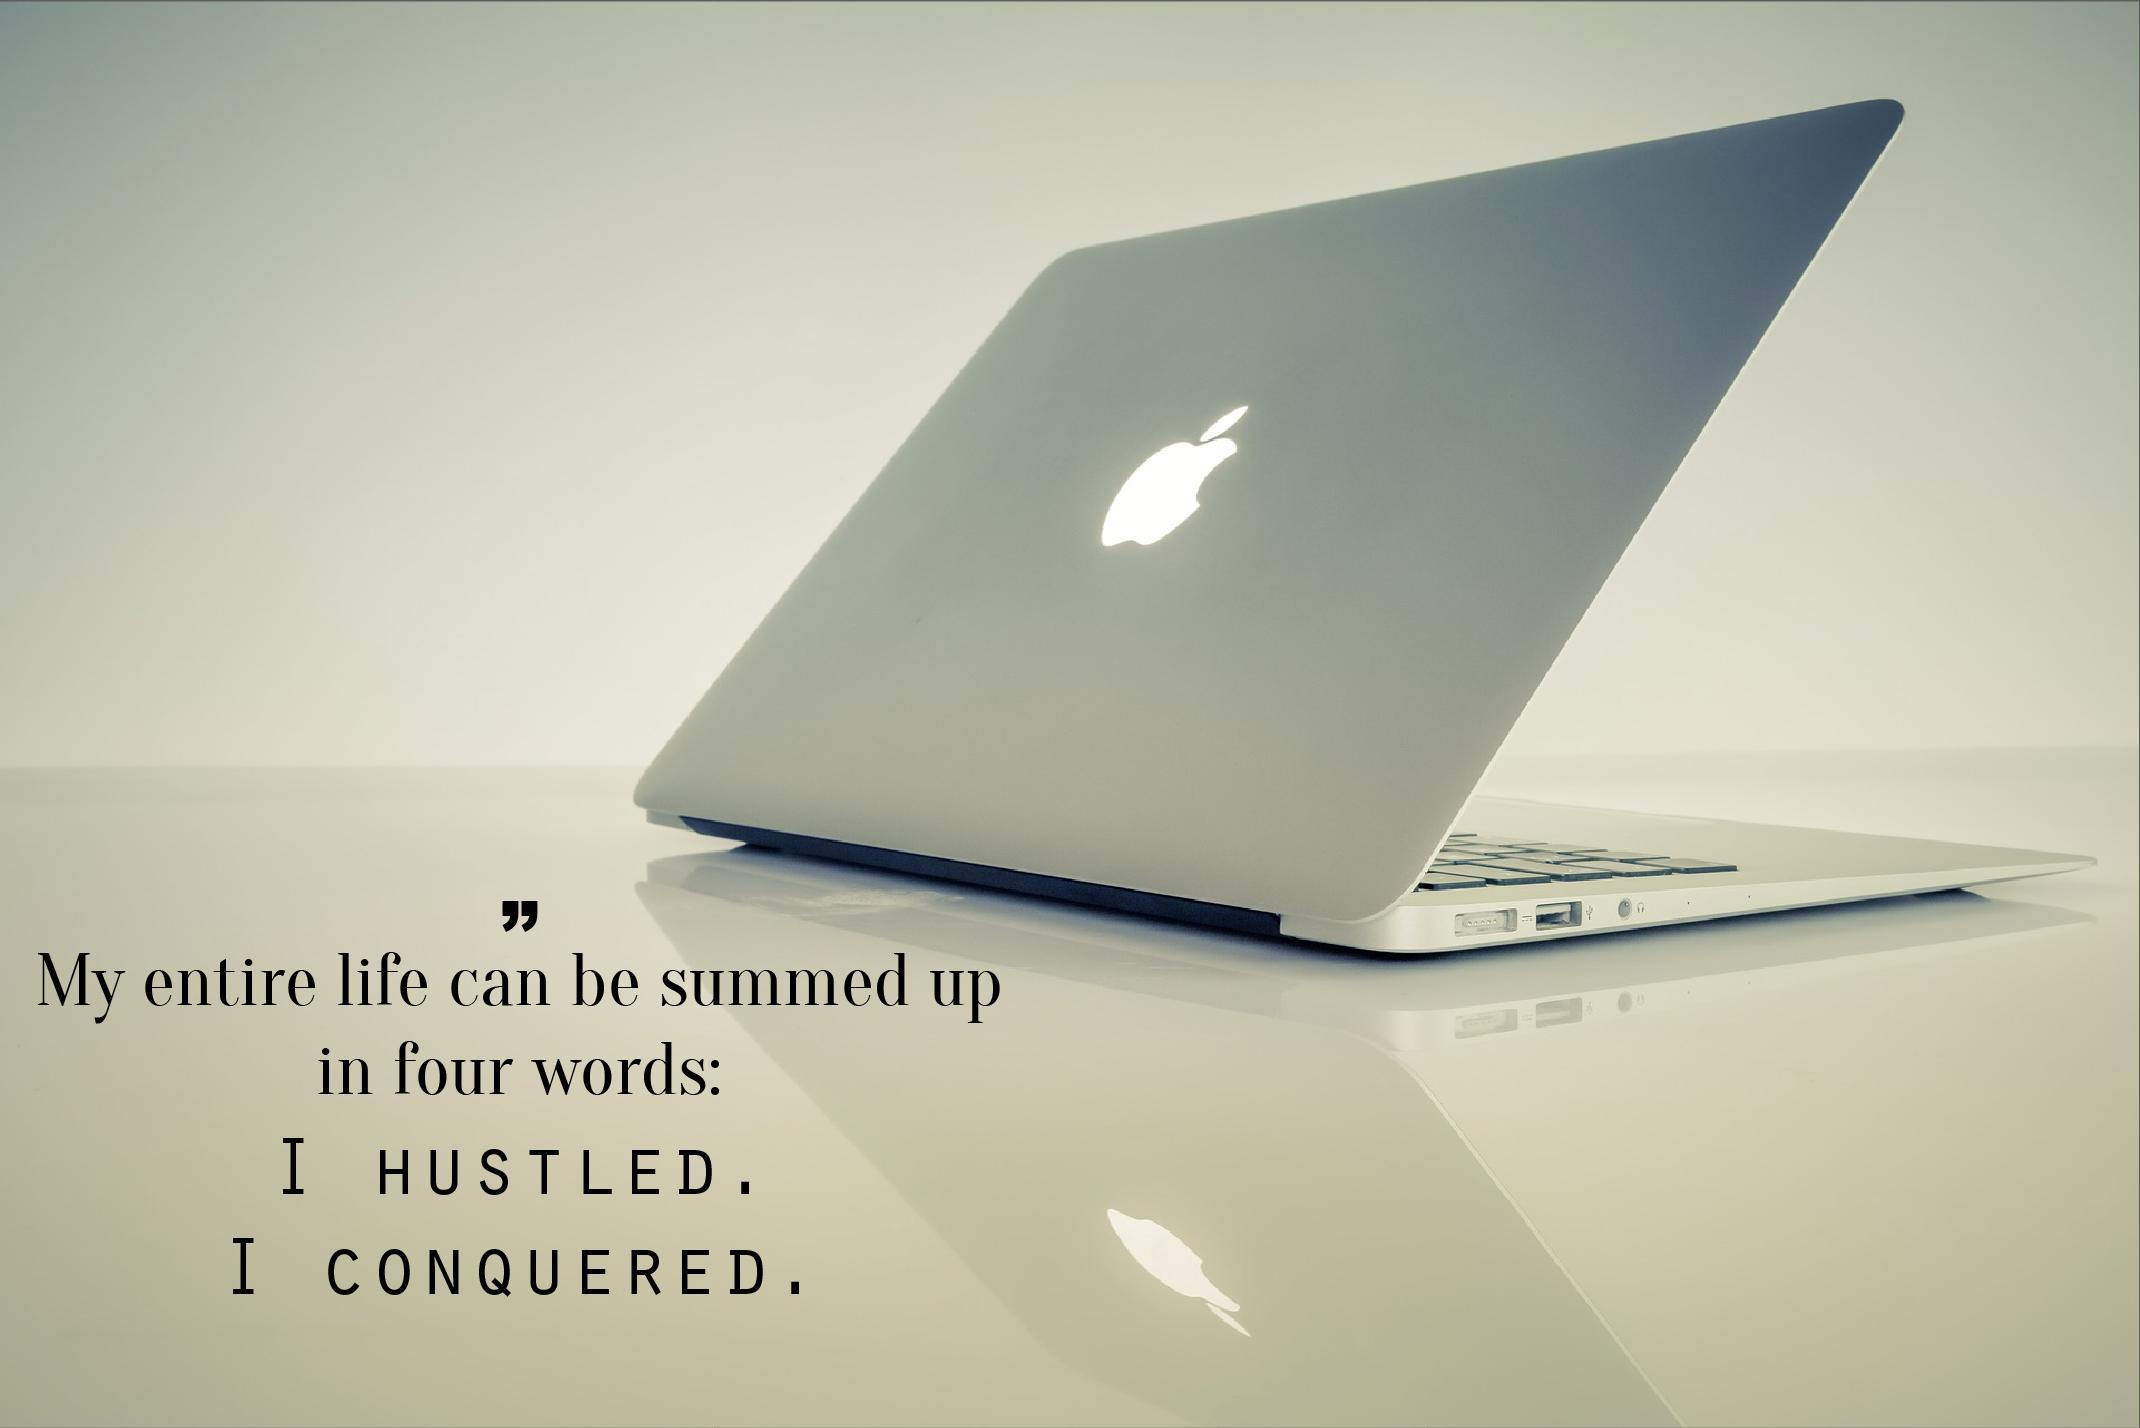 Entrepreneur Quotes Apple Laptop New Macbook Air Macbook